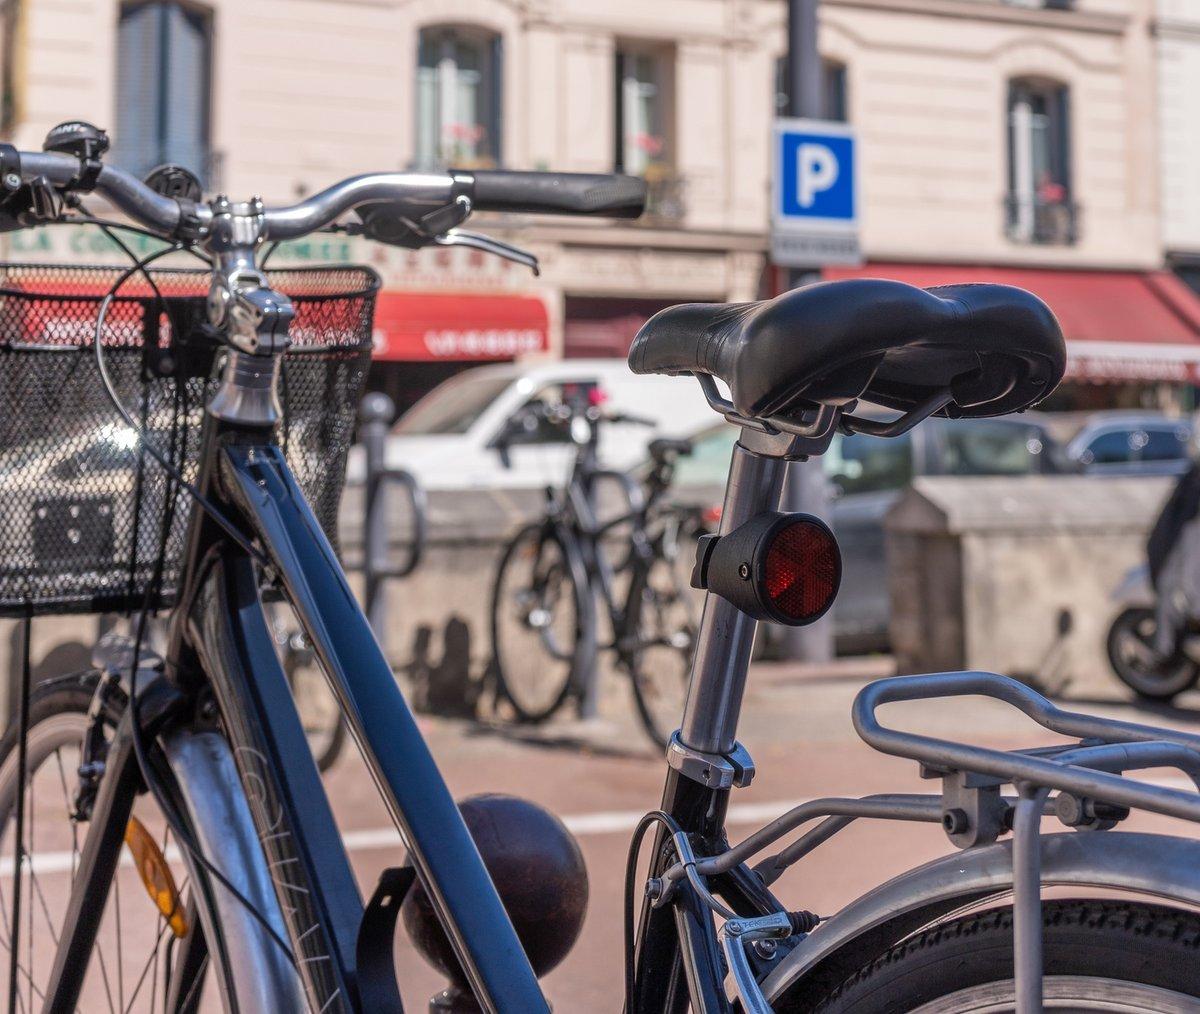 GPS Bike Tracker © Invoxia